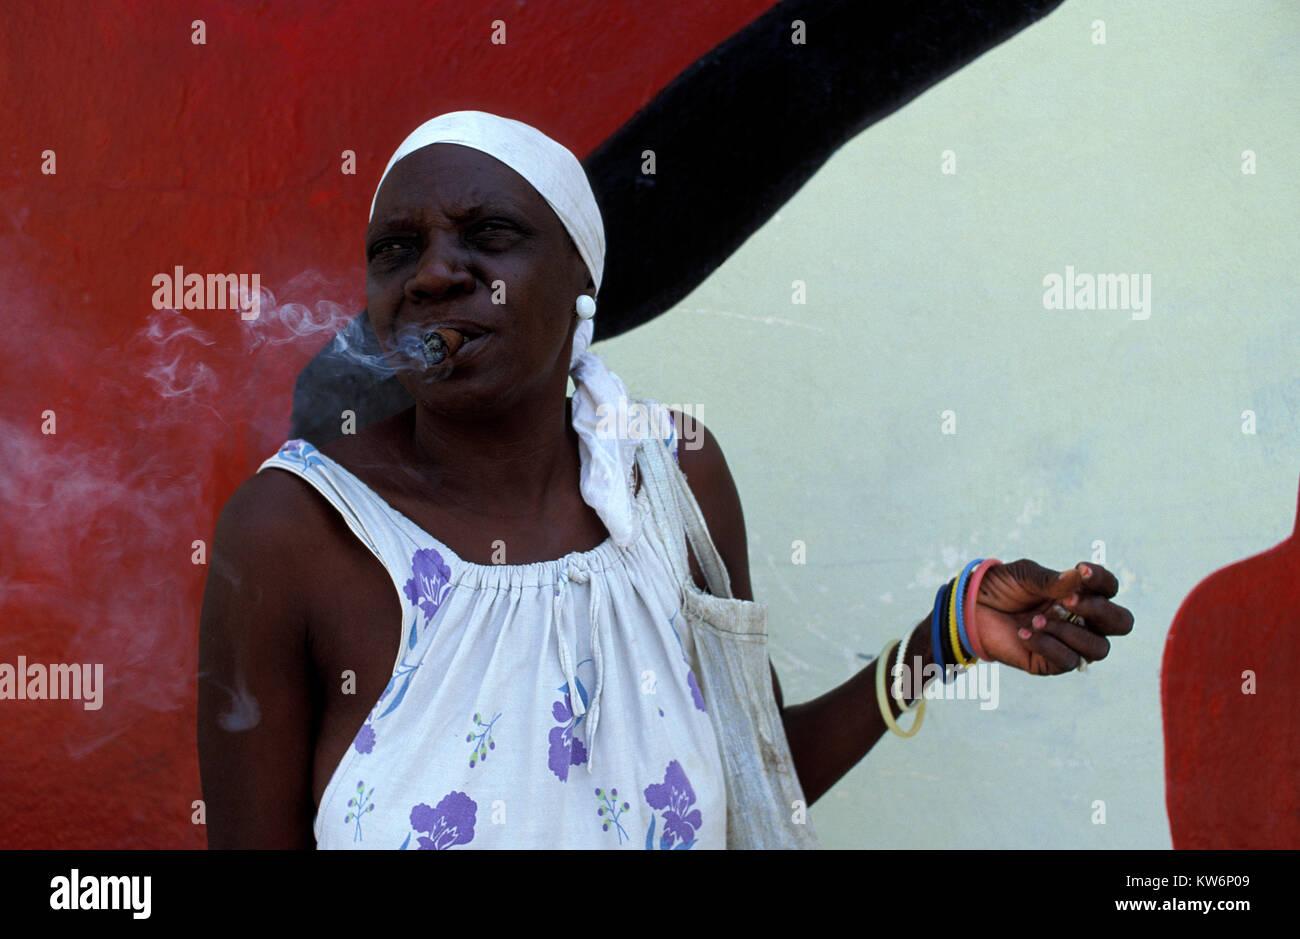 Old woman cigarre smoking, Havanna, Cuba - Stock Image